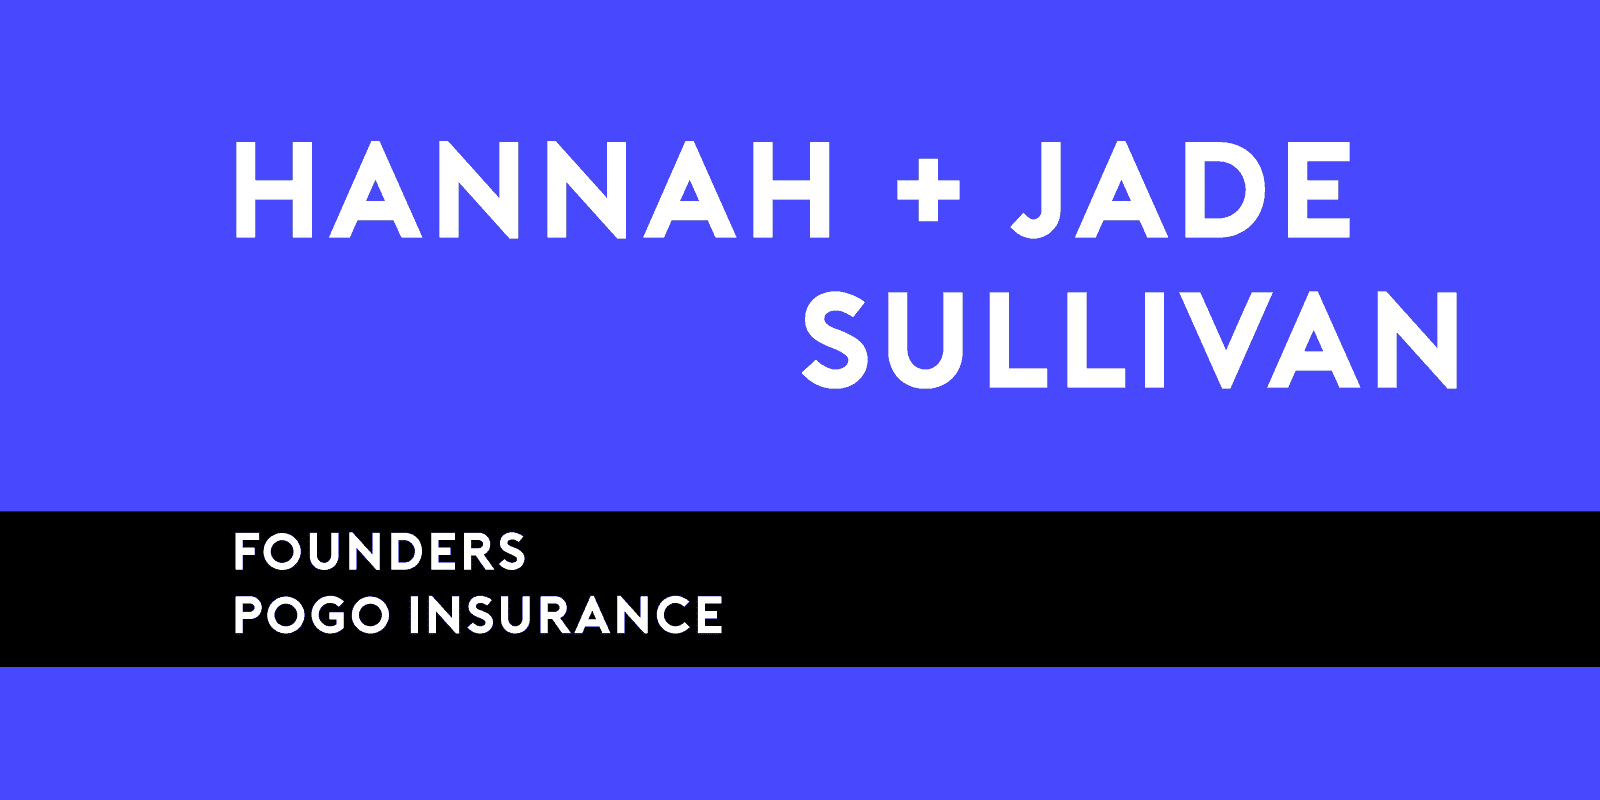 Jade and Hannah Sullivan of POGO Insurance is LegalNet Inc's Thursday Thought Leader